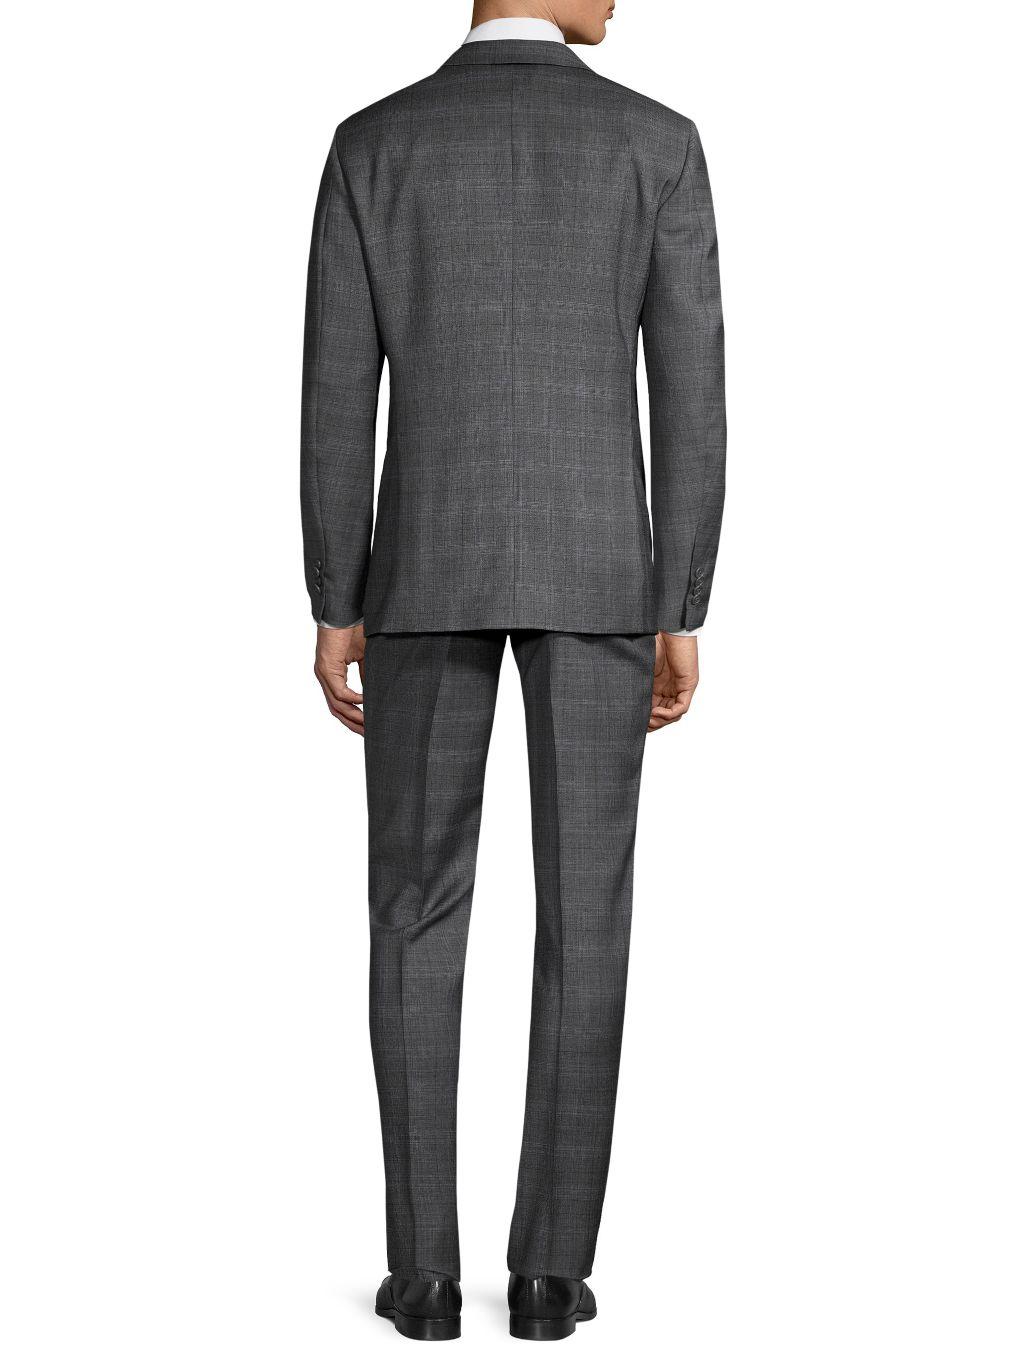 John Varvatos Star U.S.A. Standard-Fit Plaid Wool Suit